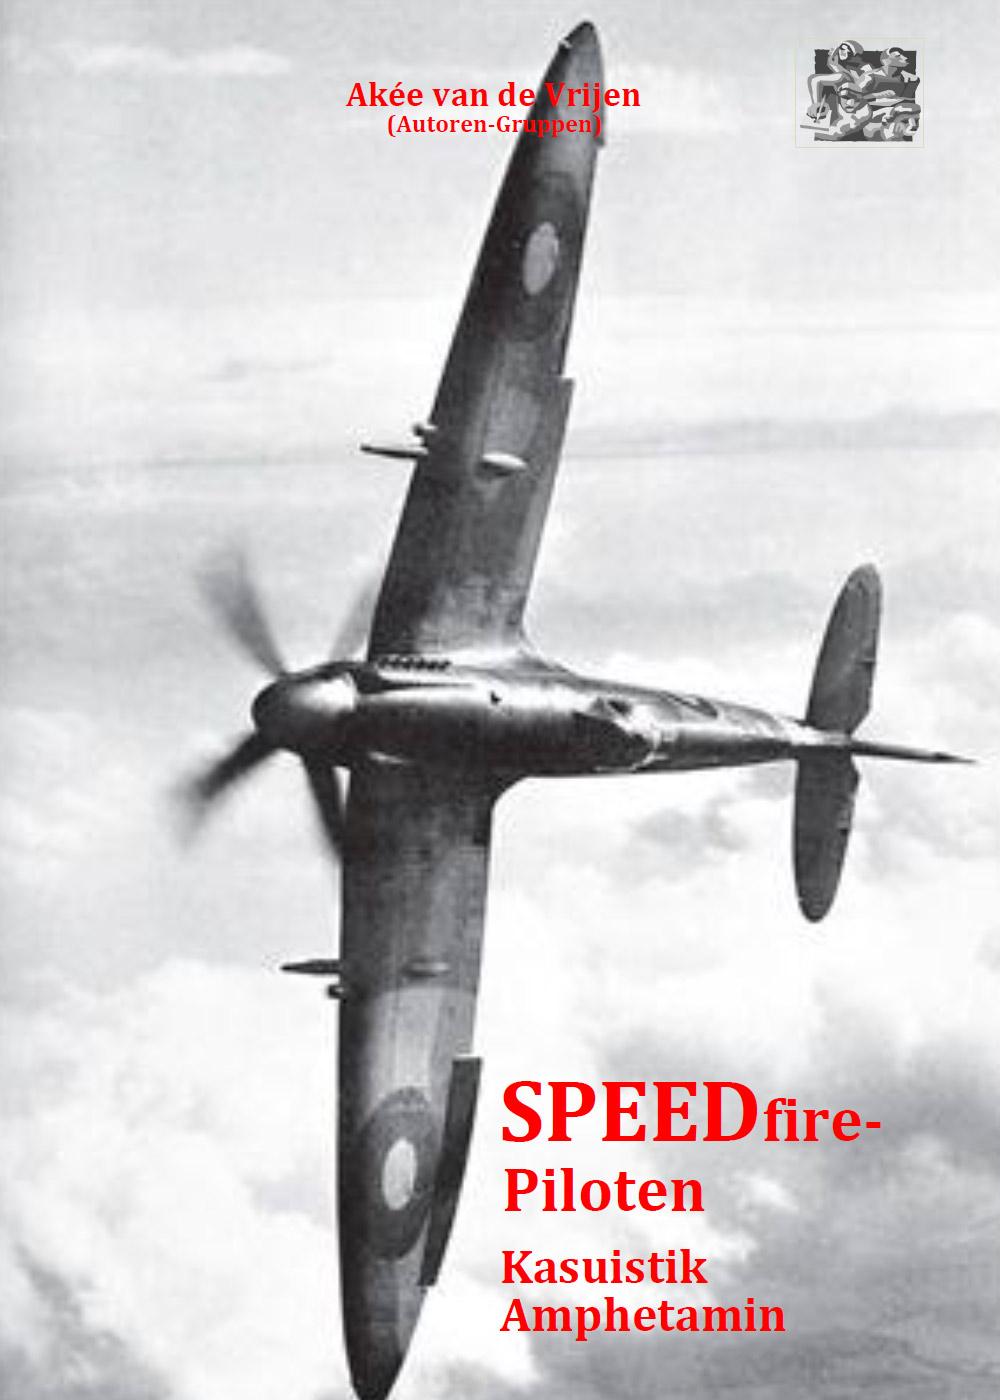 manual_speedfire